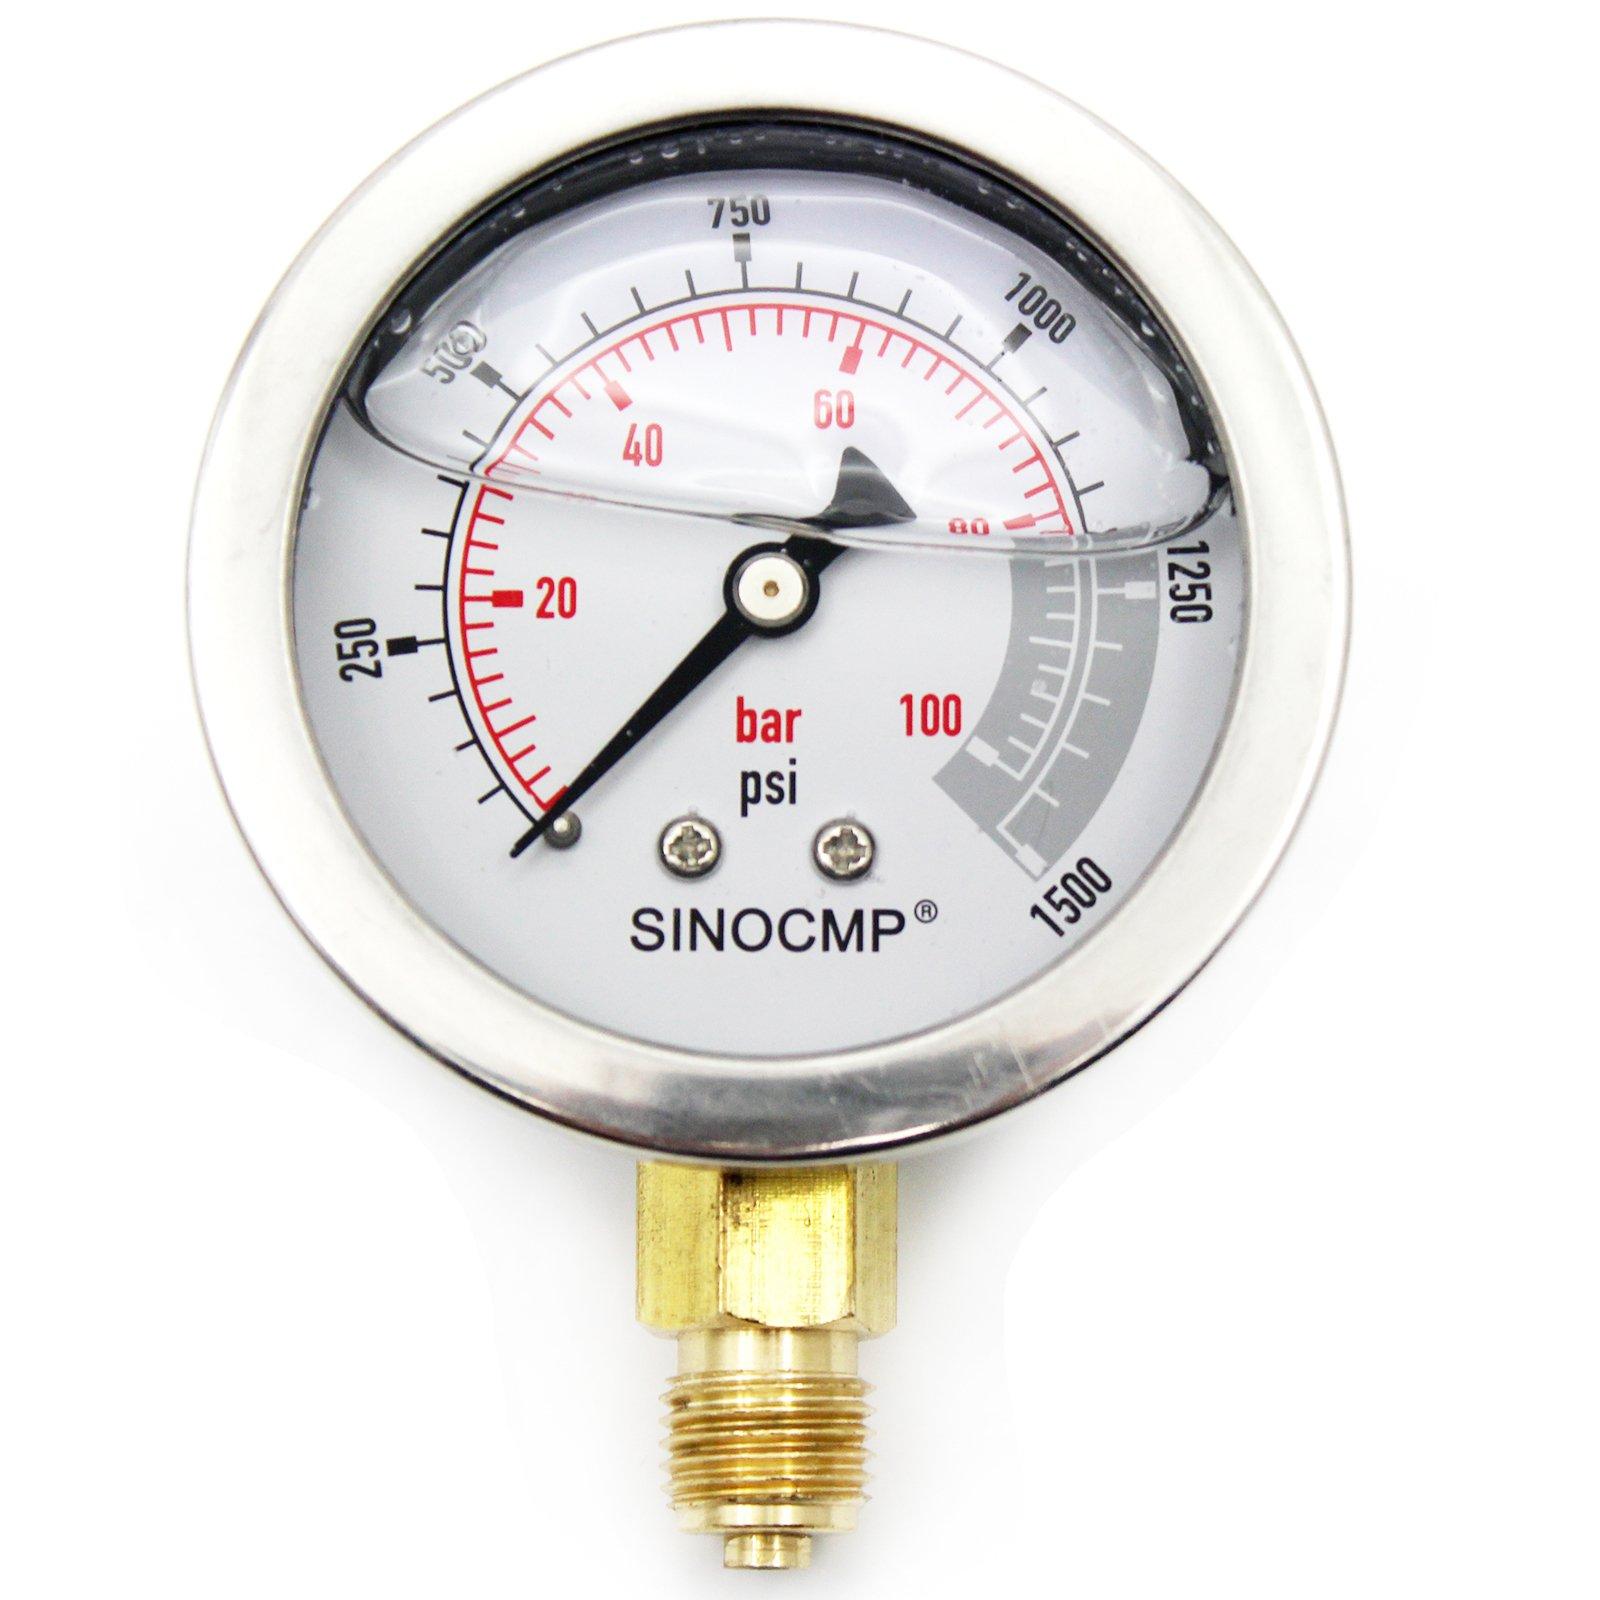 Hydraulic Pressure Gauge - SINOCMP 10Mpa/0-100Bar/0-1500PSI Economical Multi Purpose Double Scale Stainless Steel Glycerin Filled Gauge